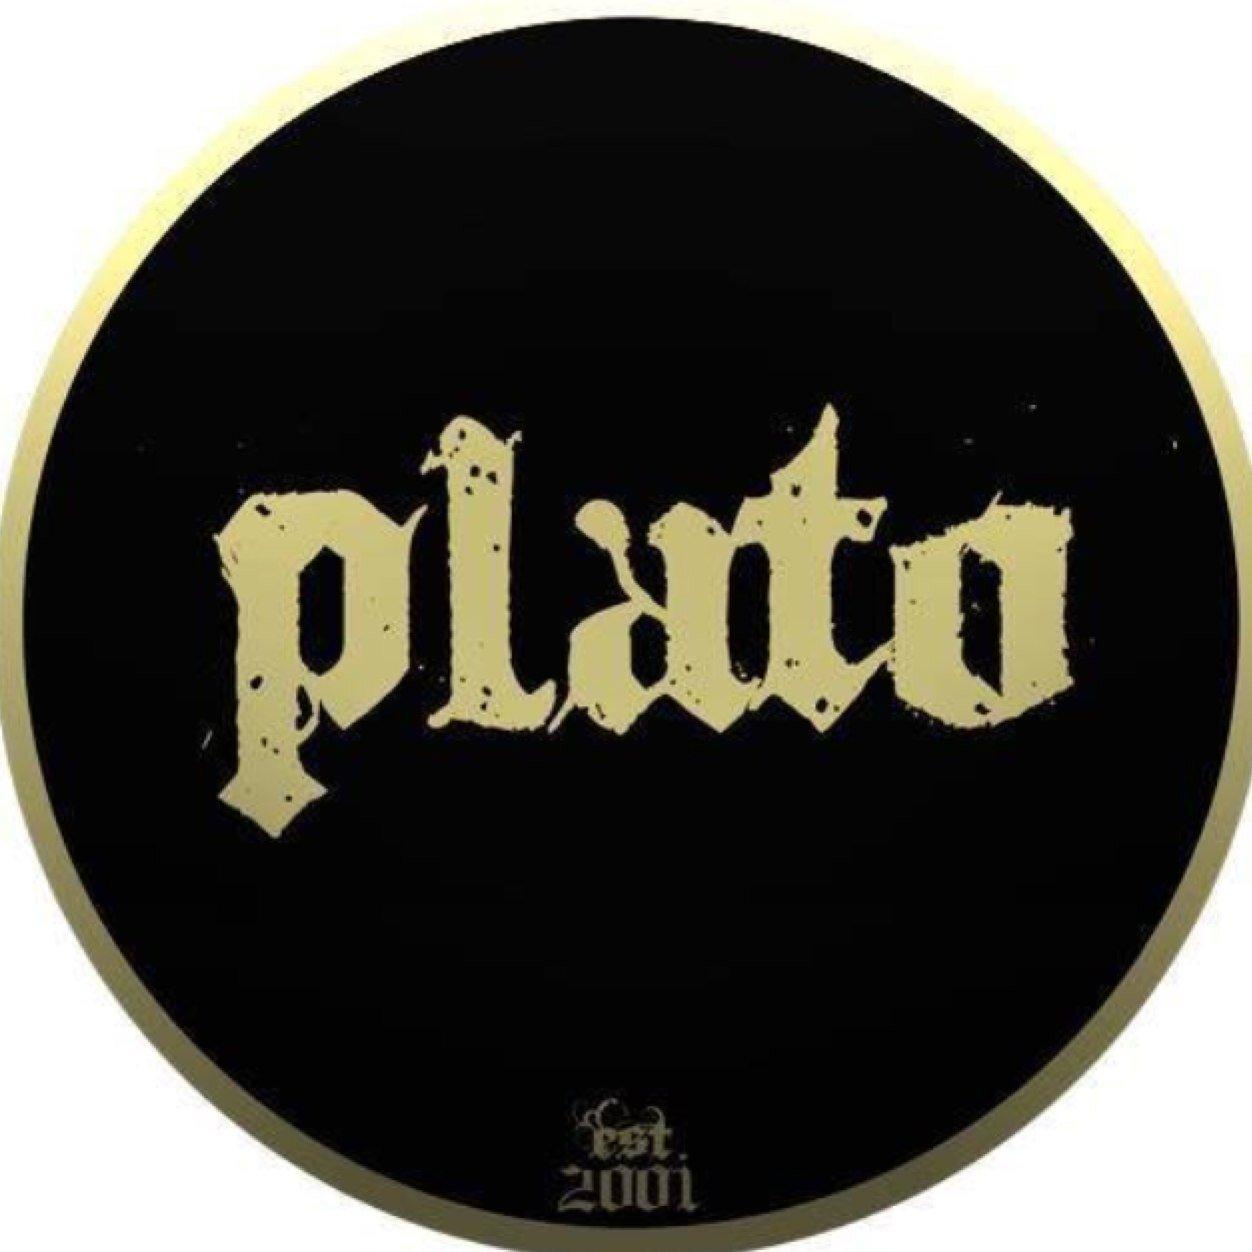 PLATO BAR & RESTAURANT